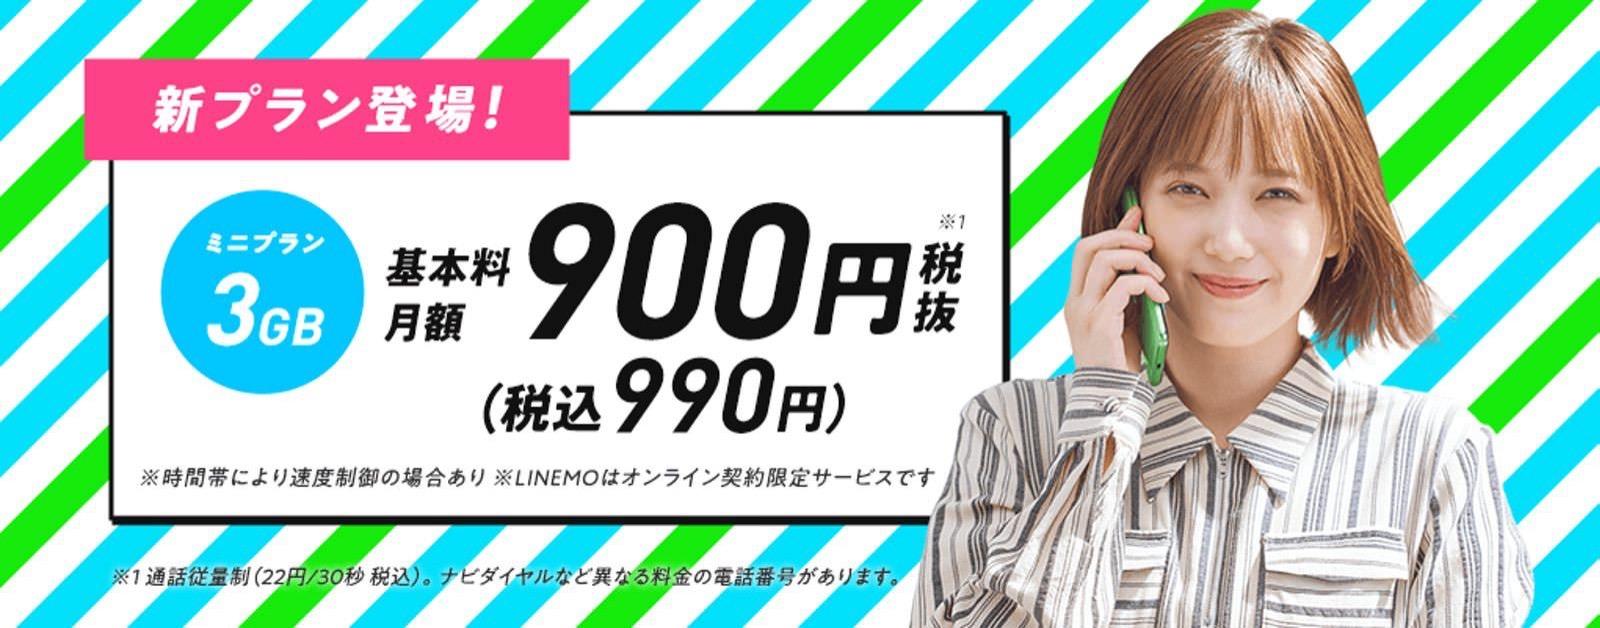 Linemo 990yenplan